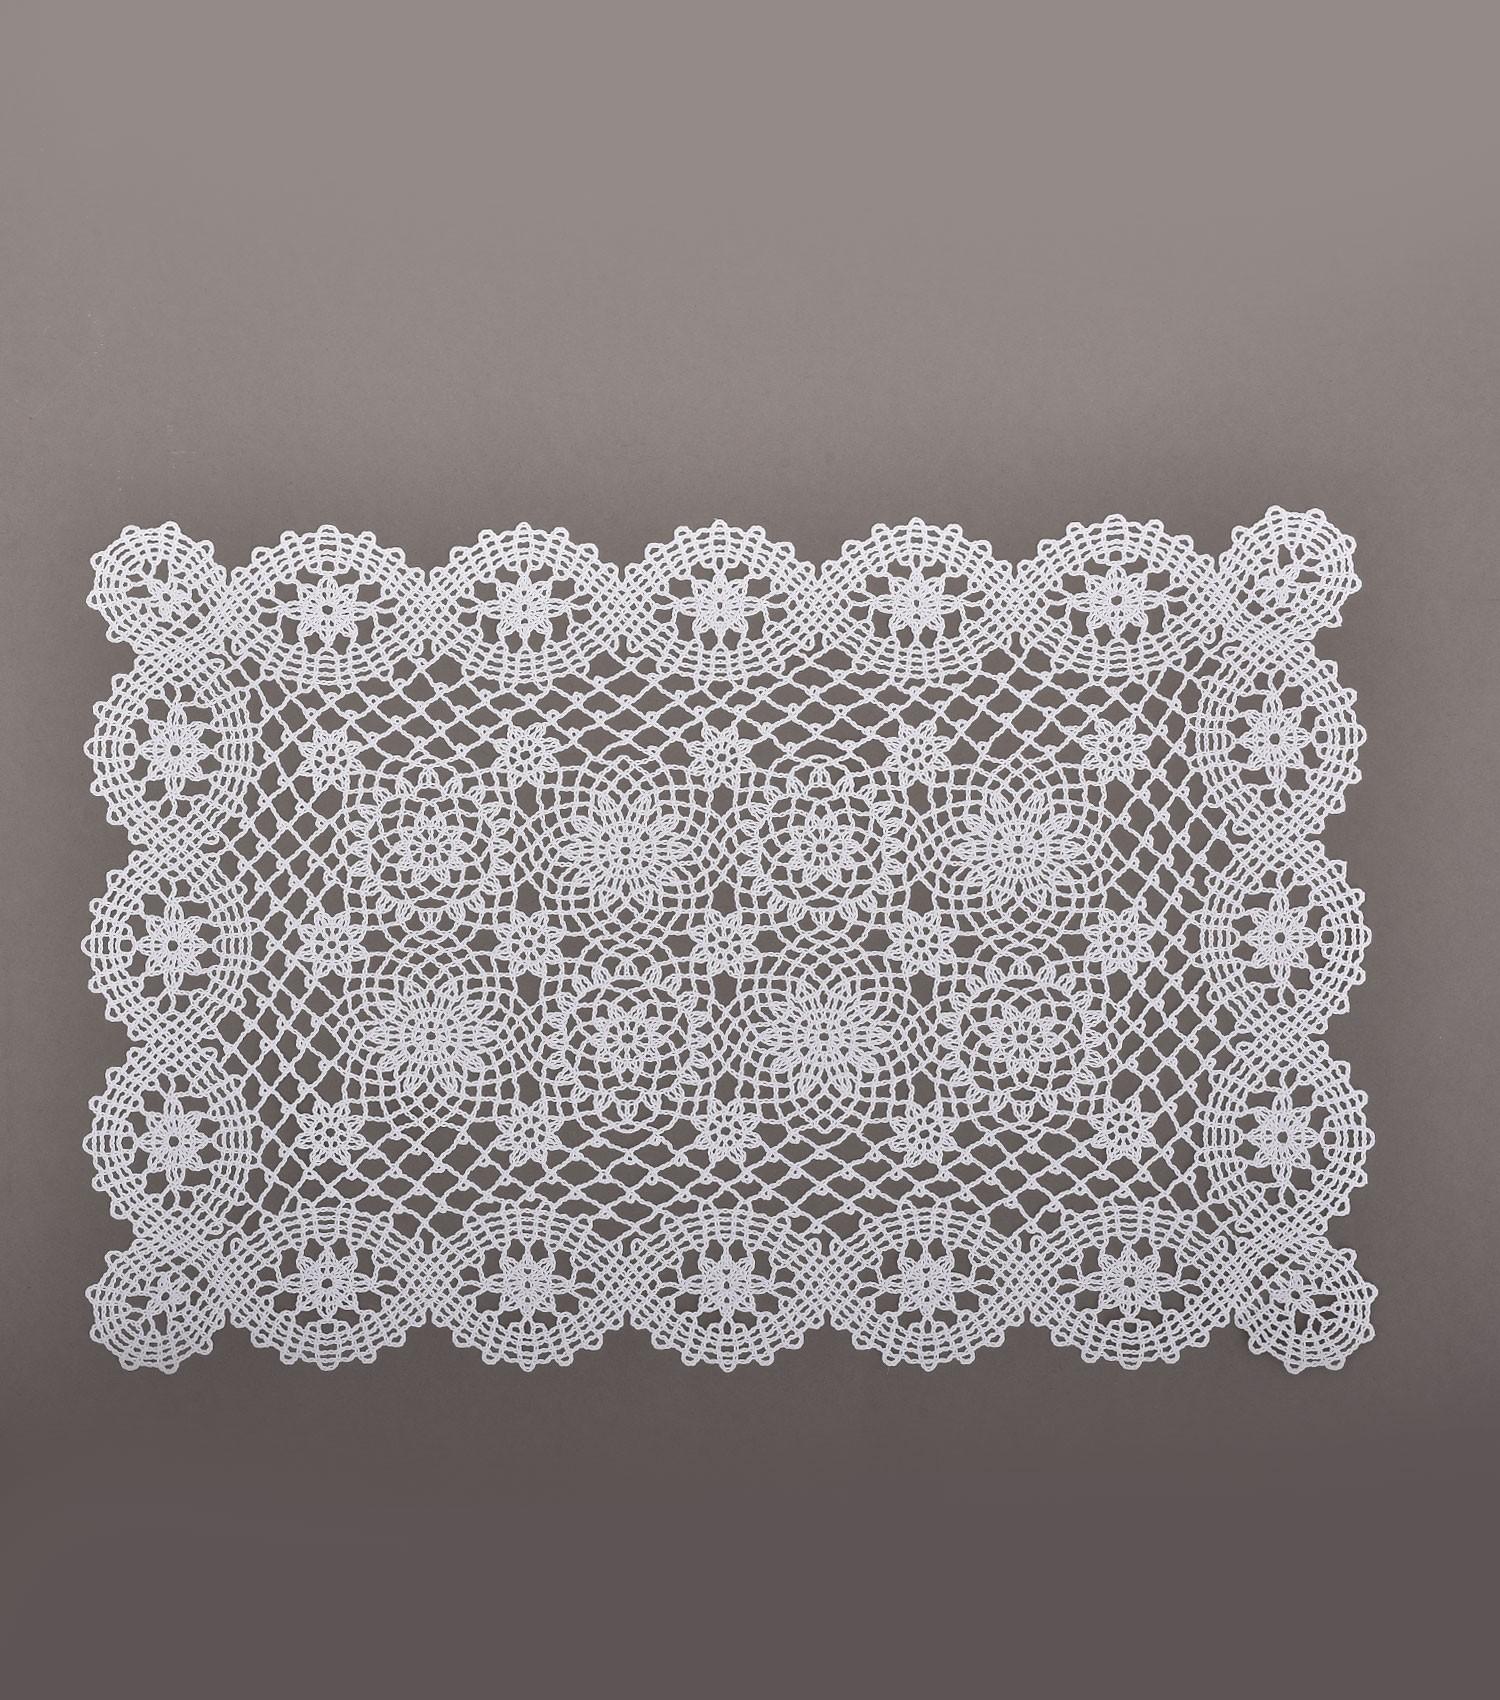 Crochet Placemat White S12